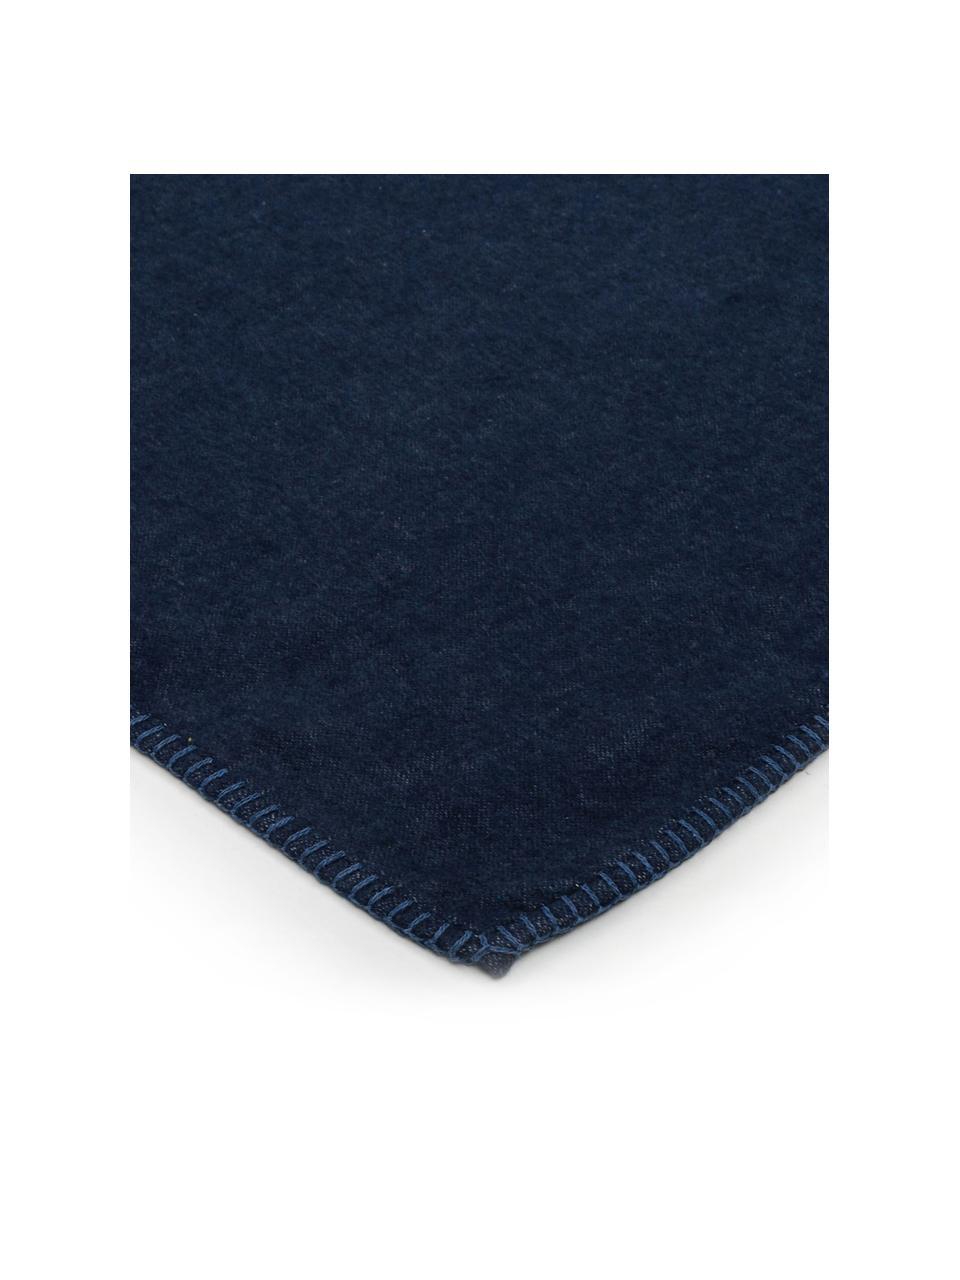 Kuscheldecke Sylt in Marineblau mit Steppnaht, Webart: Jacquard, Marineblau, 140 x 200 cm